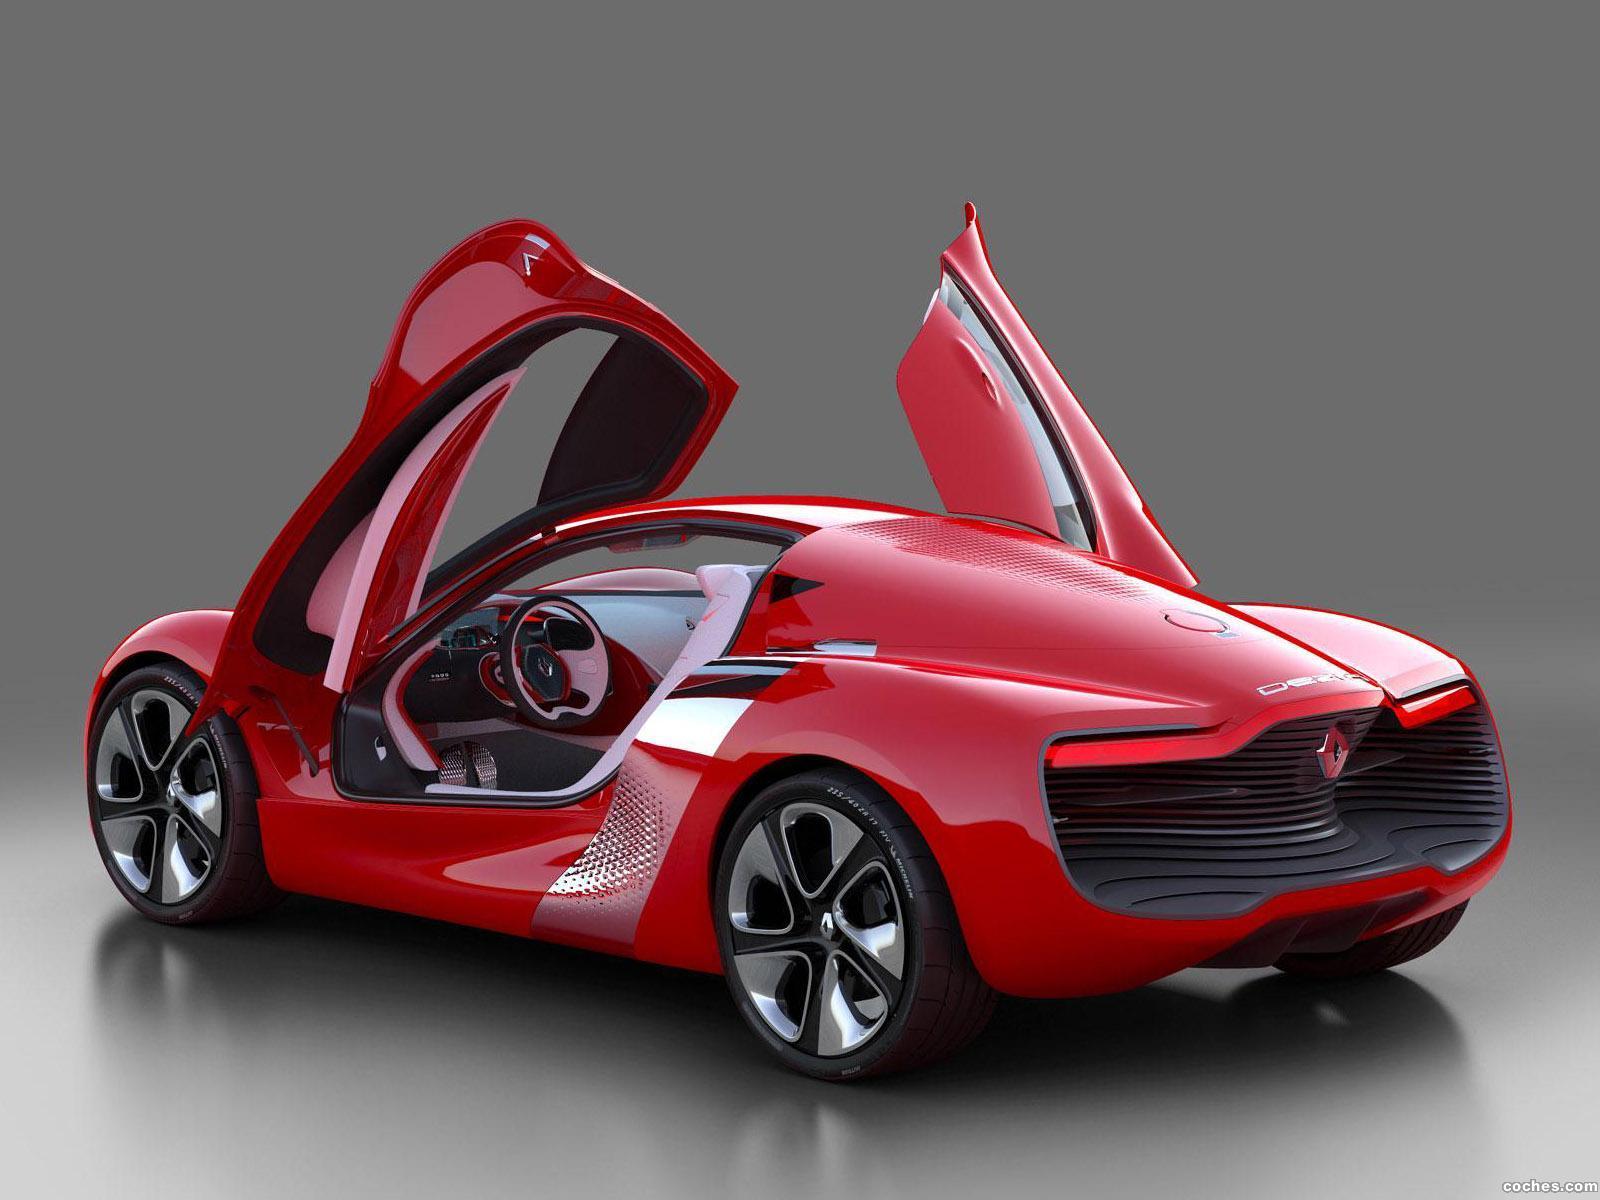 Foto 6 de Renault DeZir Concept 2010